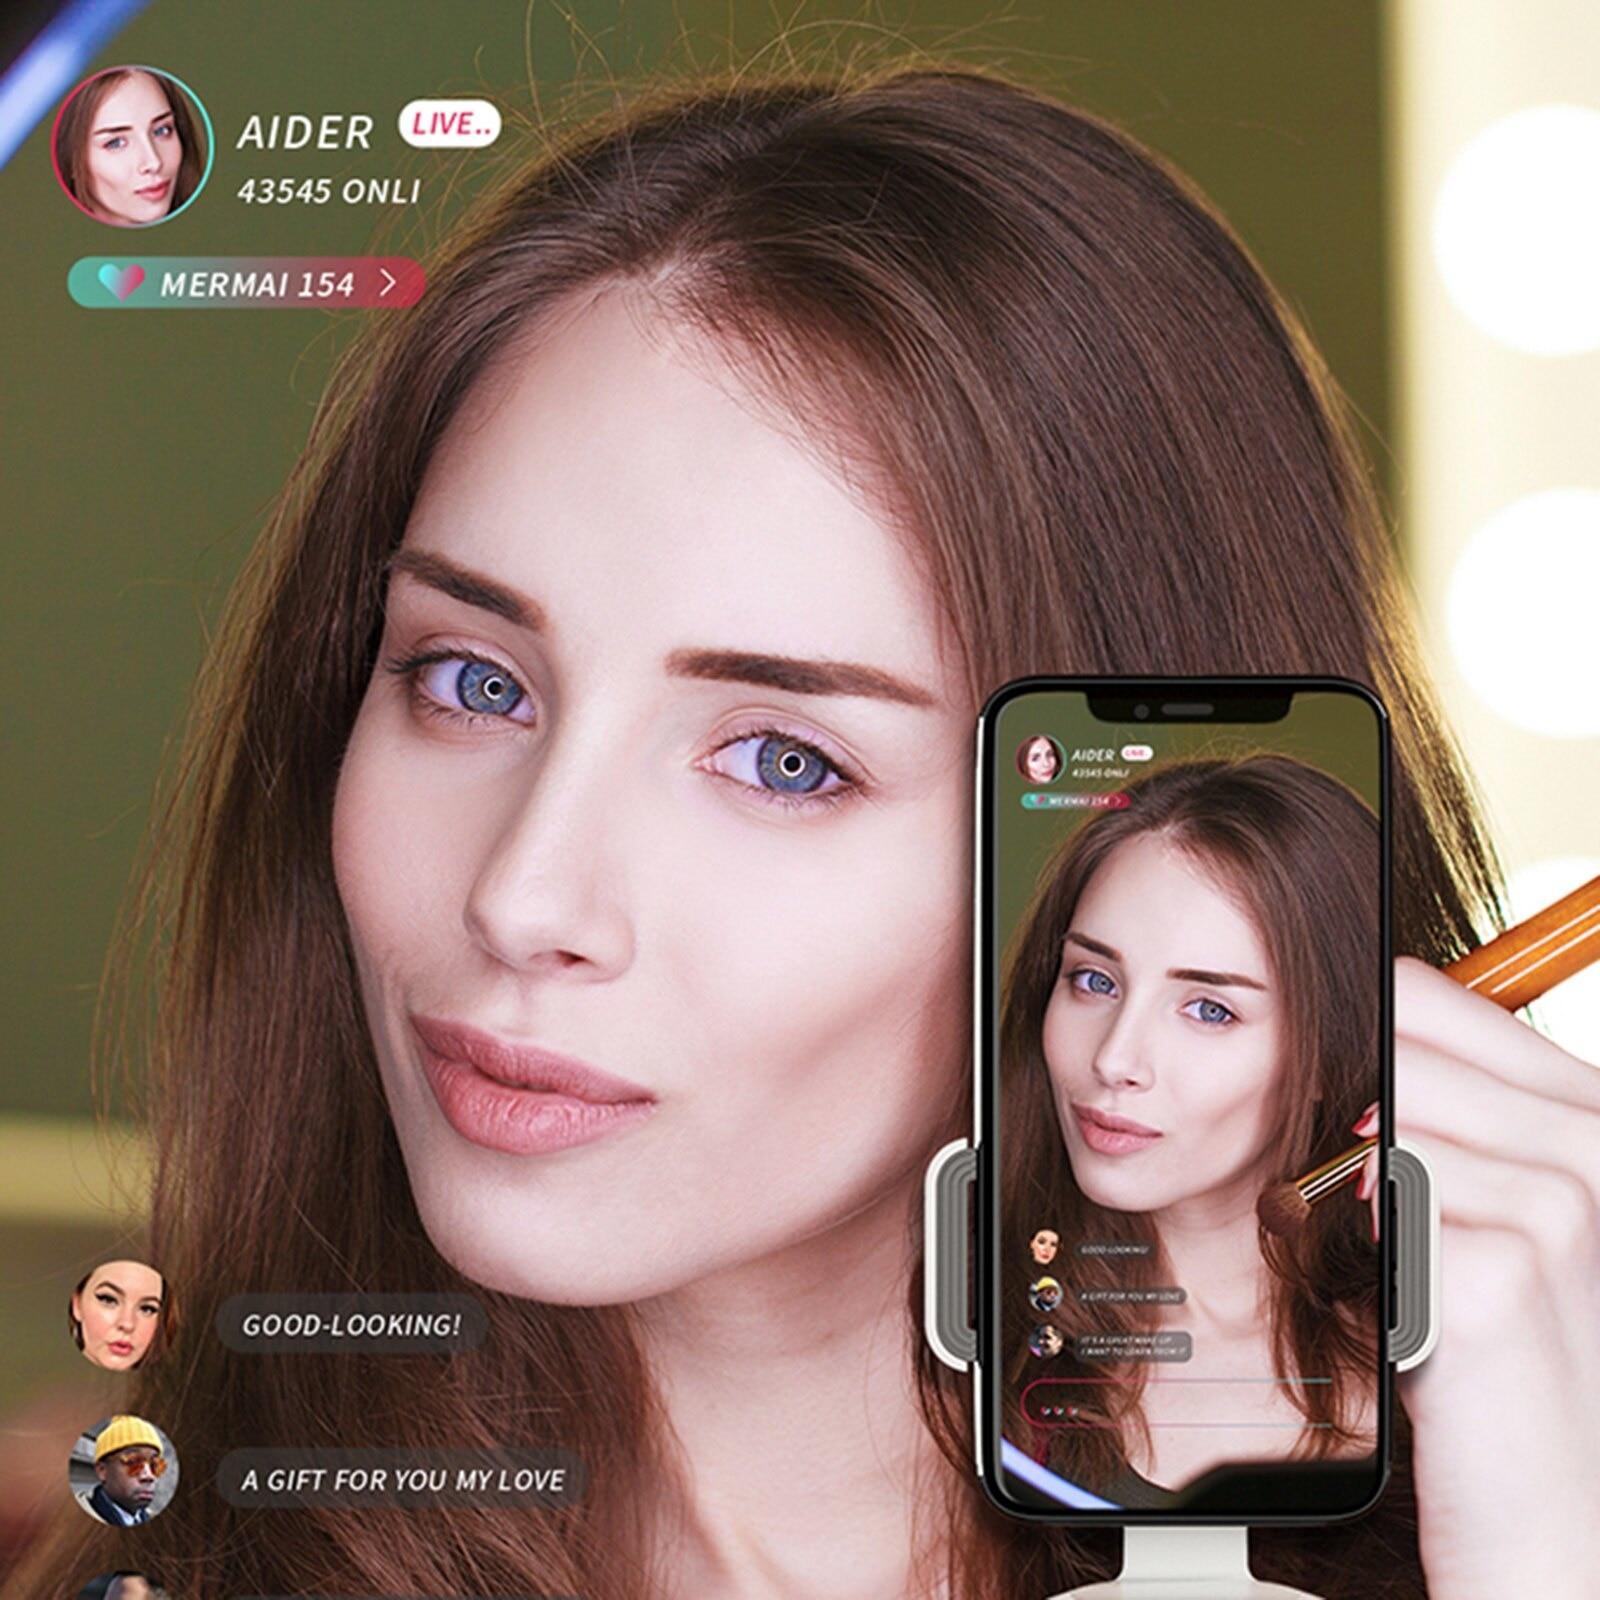 Portable 360°Rotation Auto Face & Object Tracking Selfie Stick Smart Shooting Phone Mount Gimbal Vlog Smartphone Mount Holder enlarge